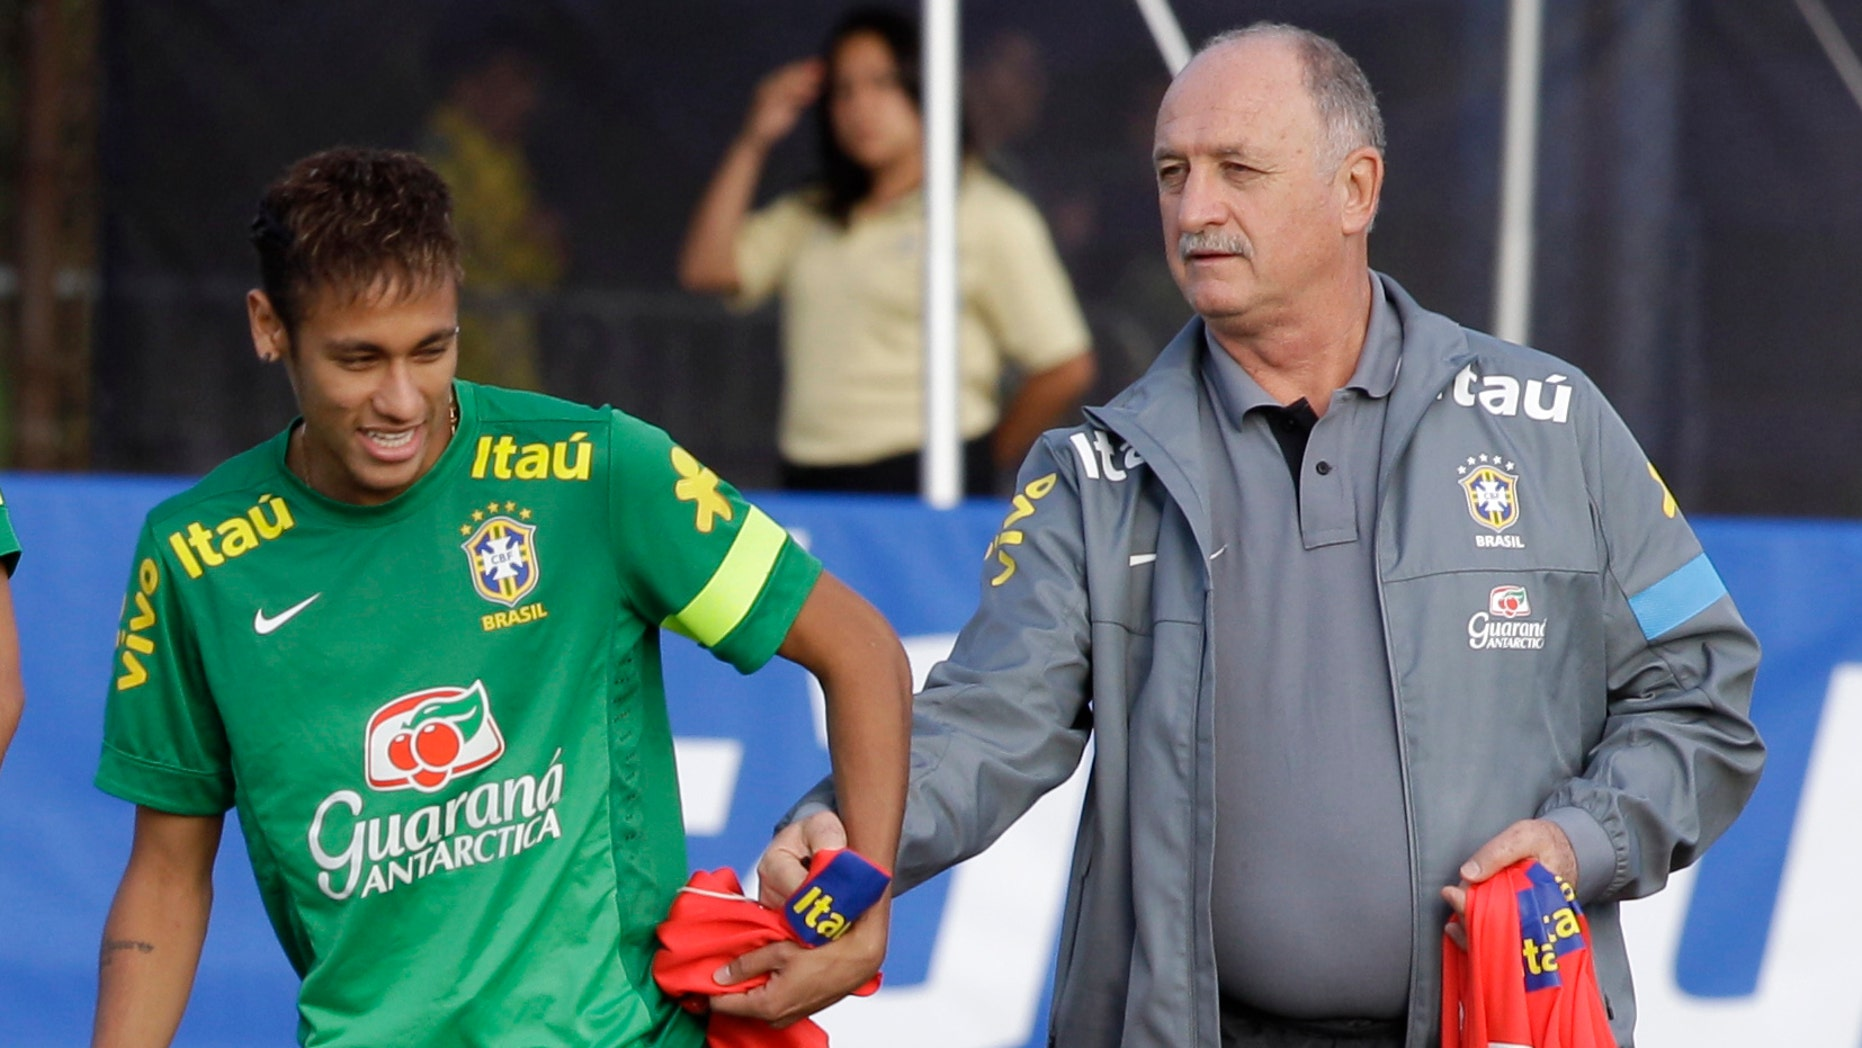 Brazil coach Luis Felipe Scolari, right, with star striker, Neymar, during a national team practice on Nov. 14, 2013 (AP/Javier Galeano)